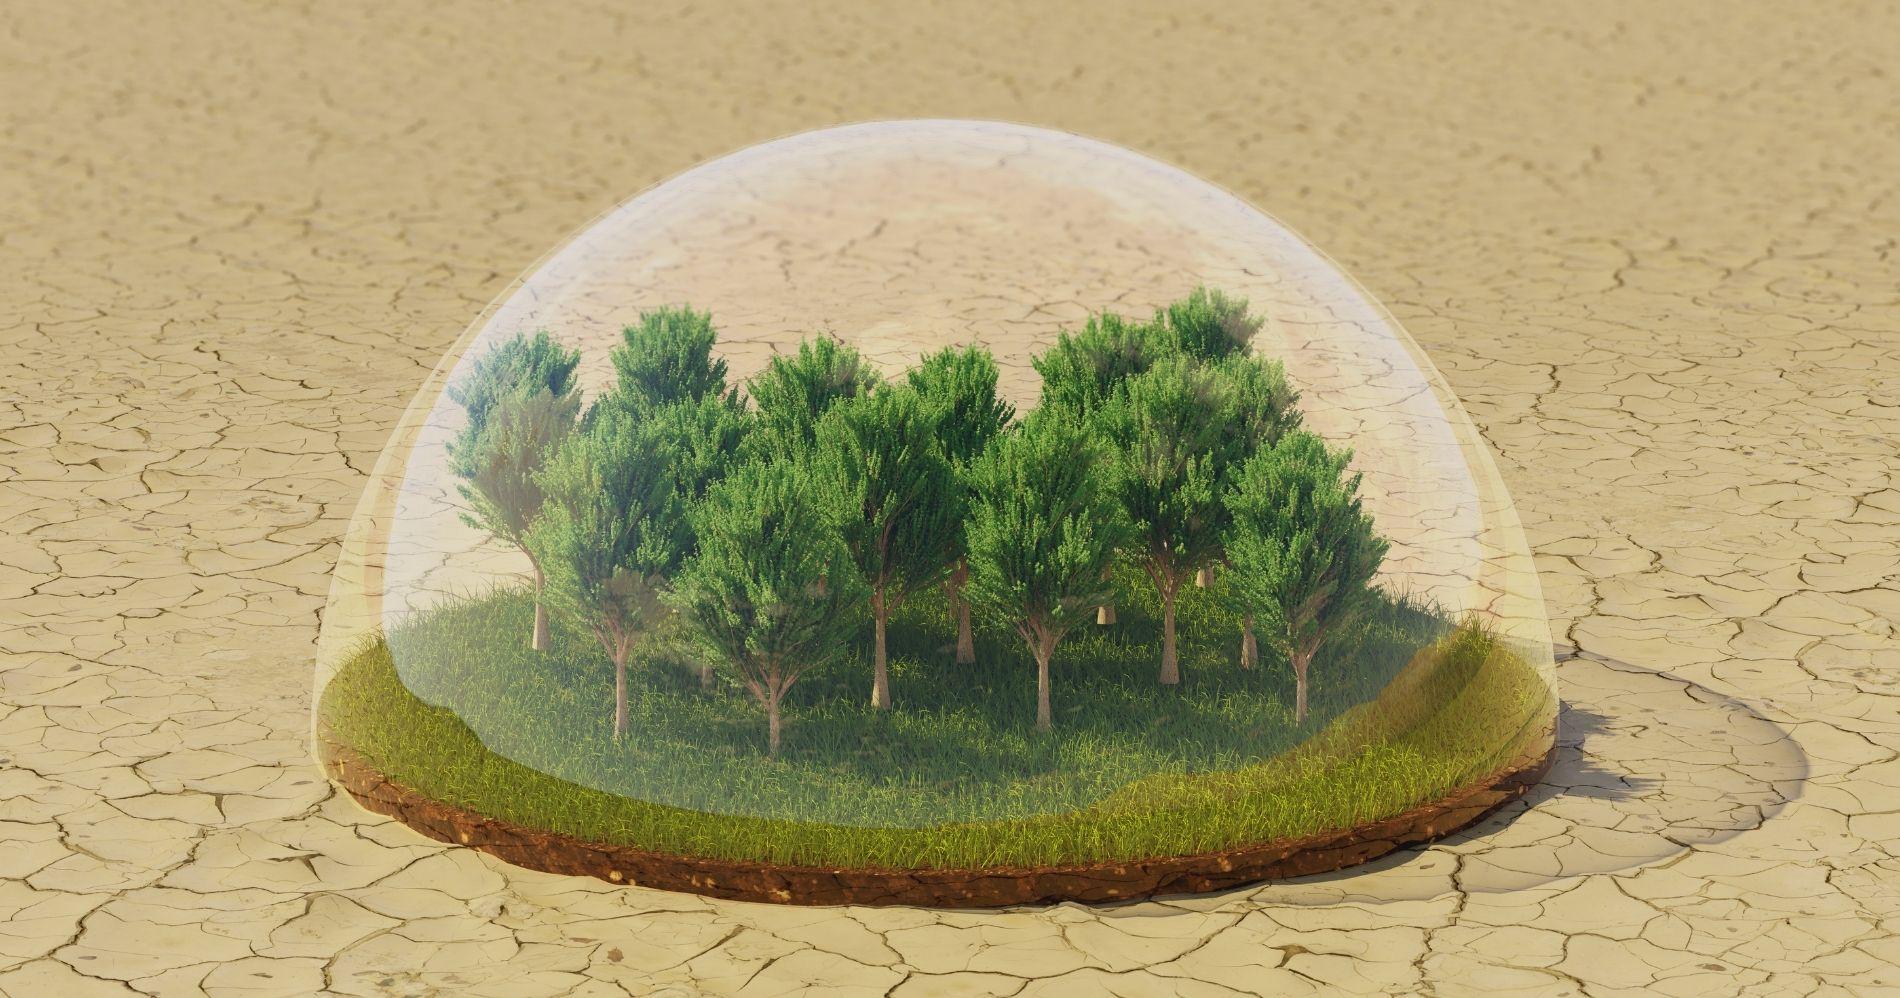 Creo Syndicate Organisasi Peduli Lingkungan Illustration Web Bisnis Muda - Canva